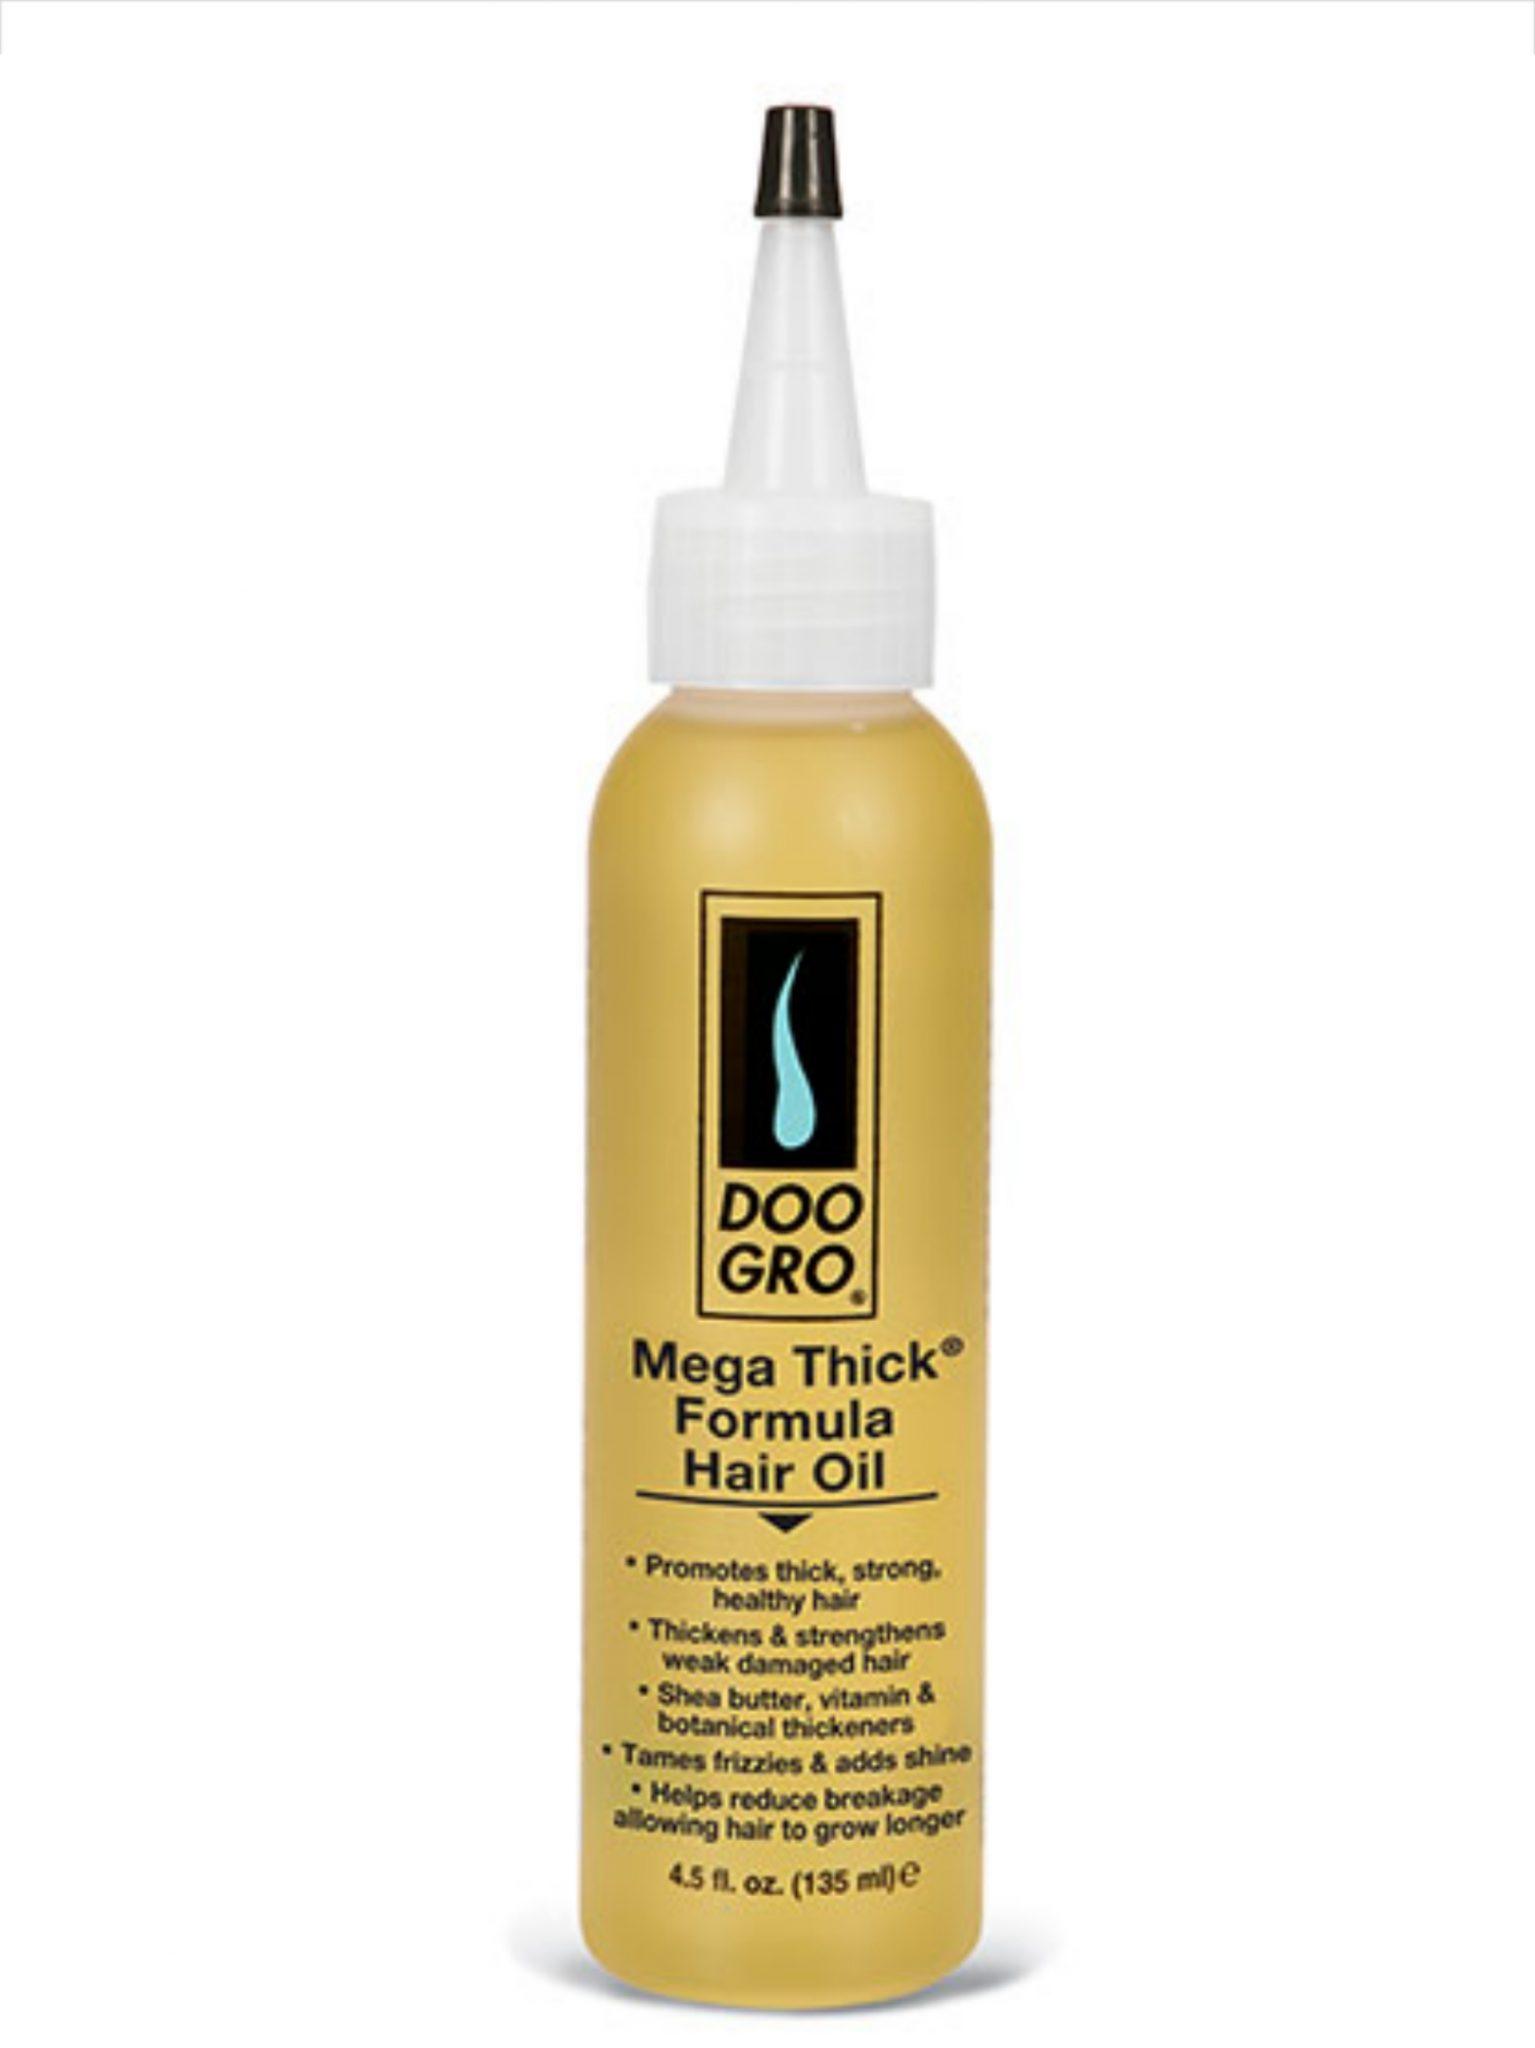 Doo Gro Mega Thick Formula Hair Oil 4.5Oz